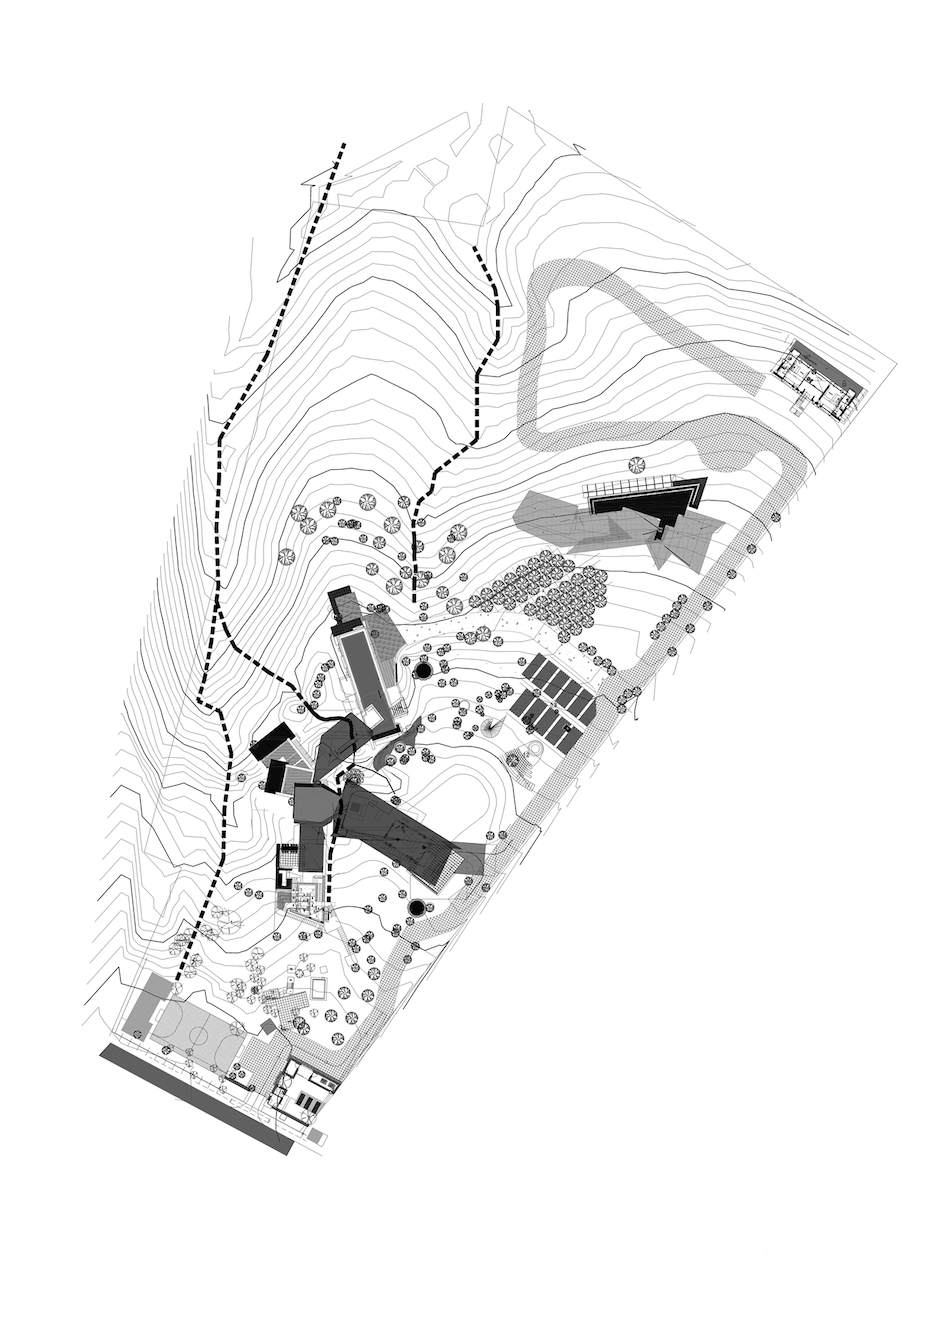 House of Three Streams site plan